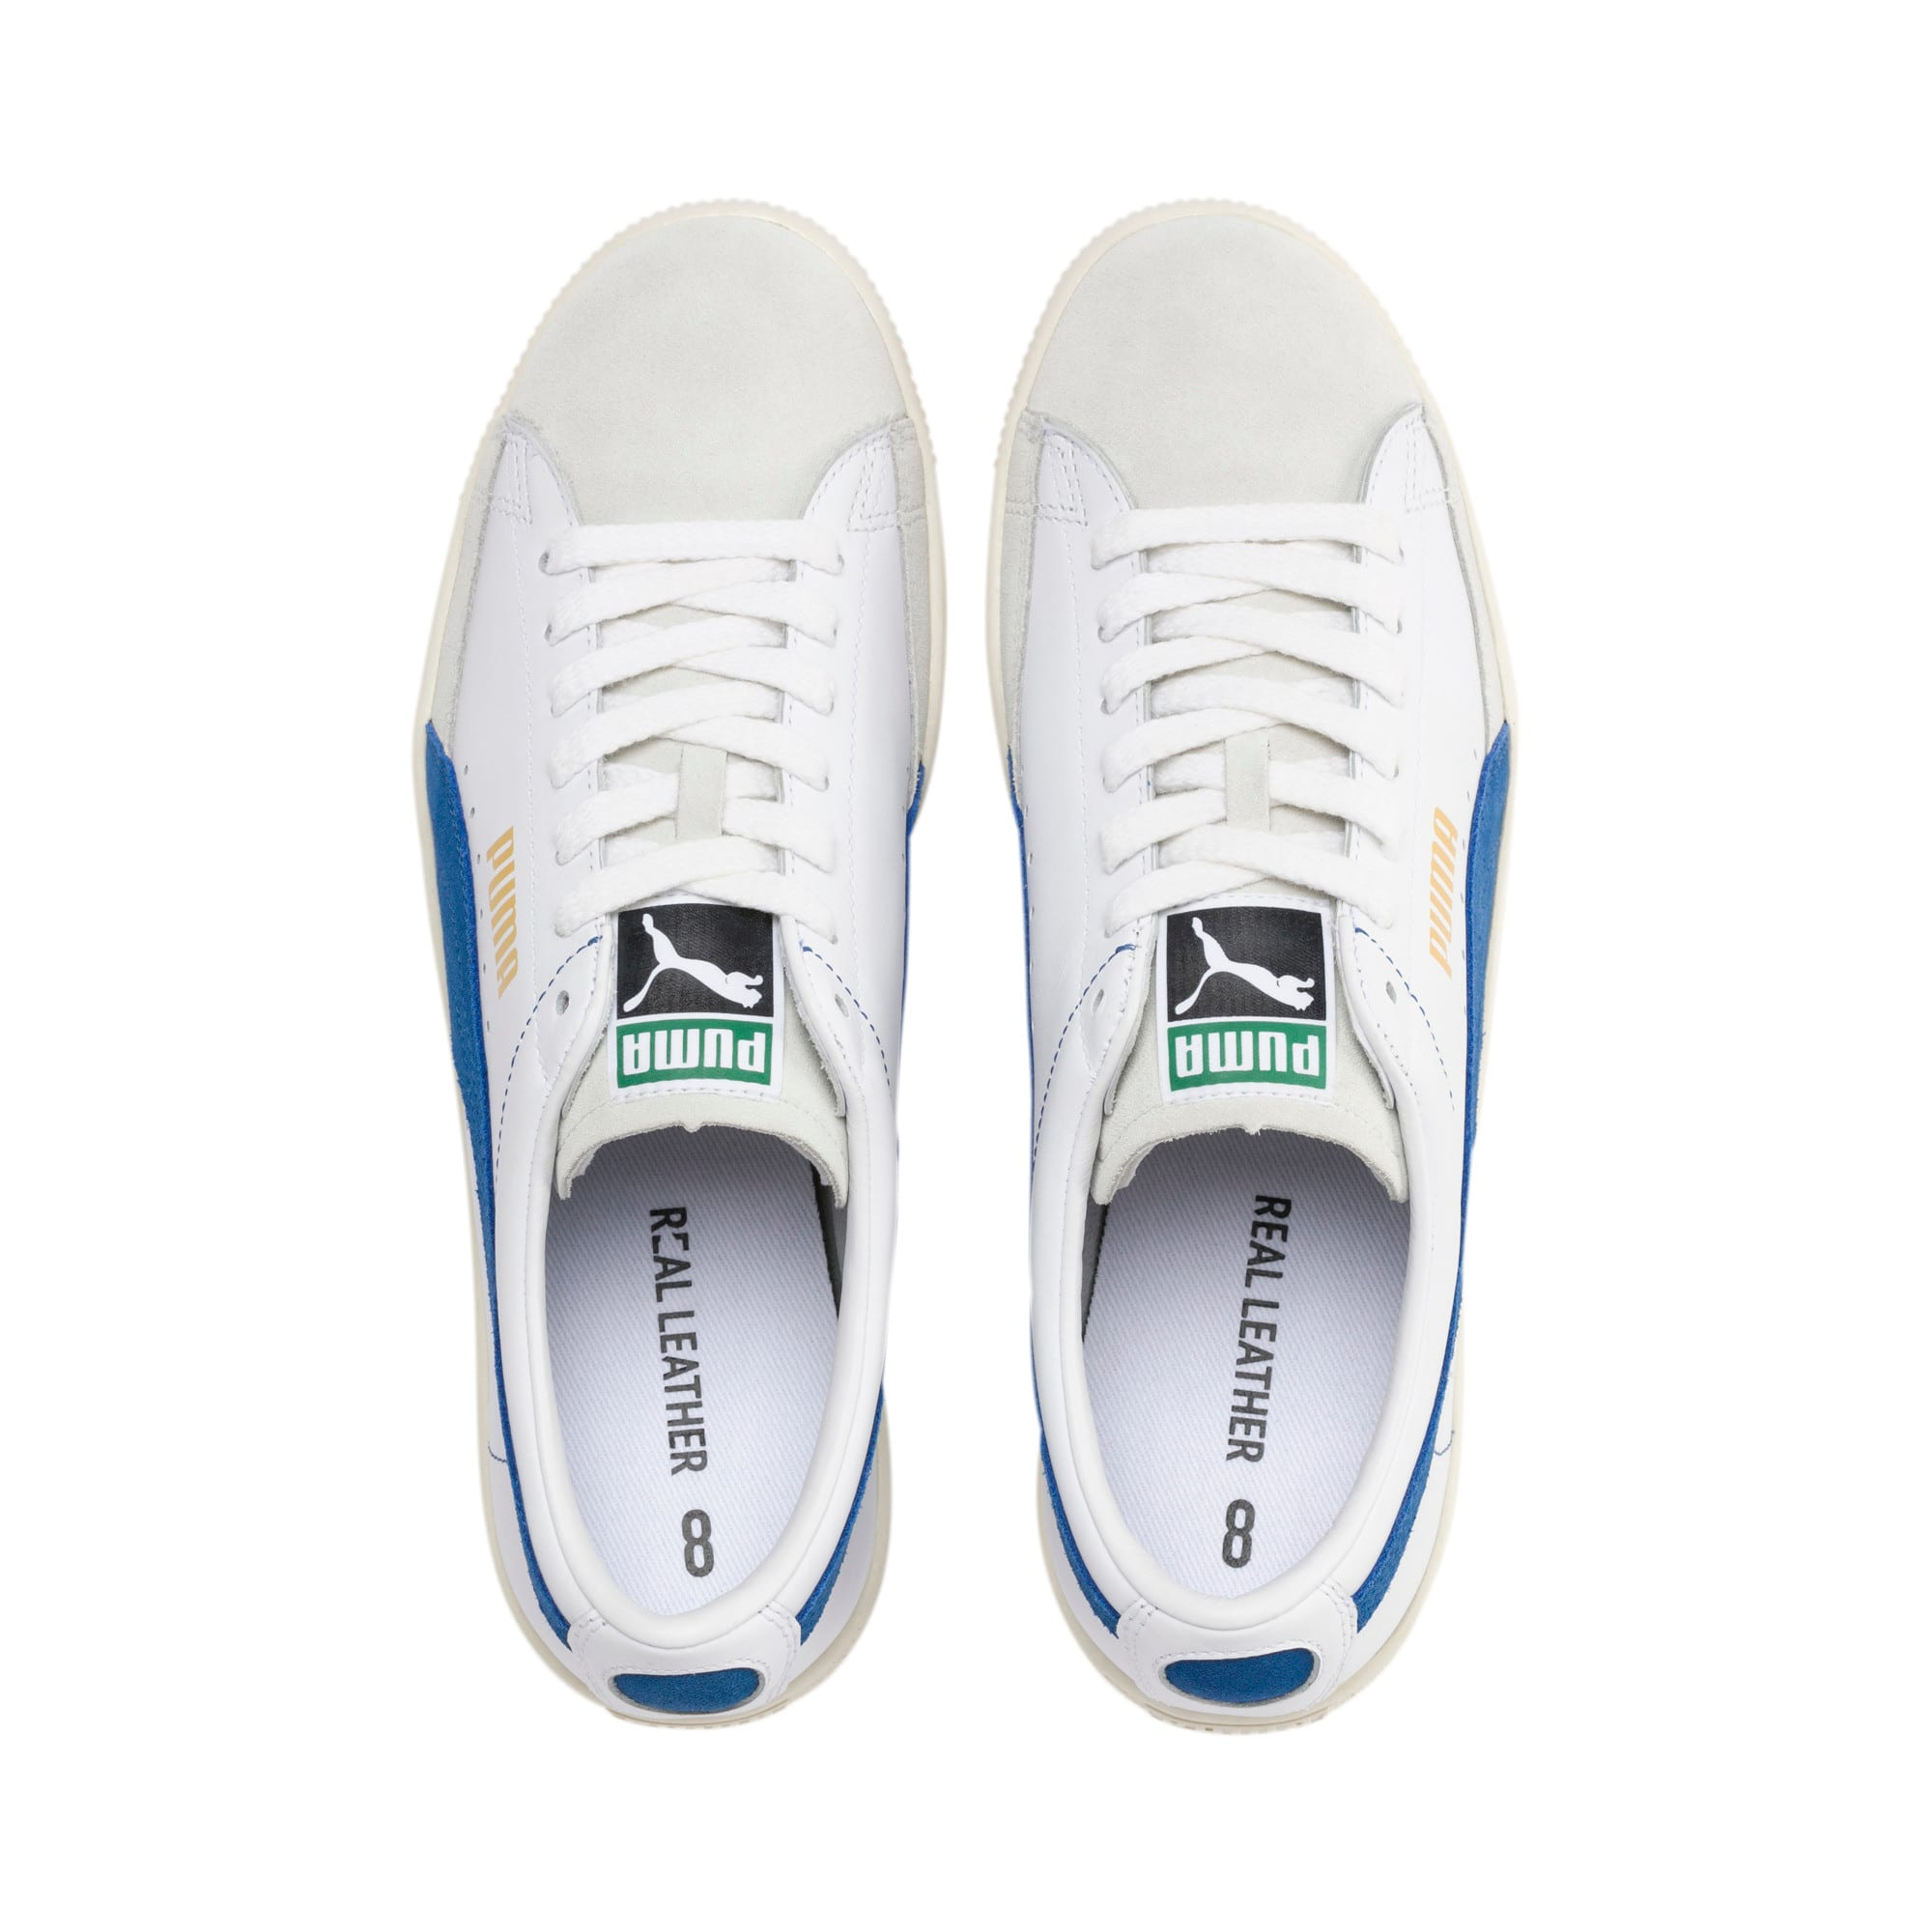 Thumbnail 7 of Basket 90680 Sneakers, Puma White-Galaxy Blue-Whisp, medium